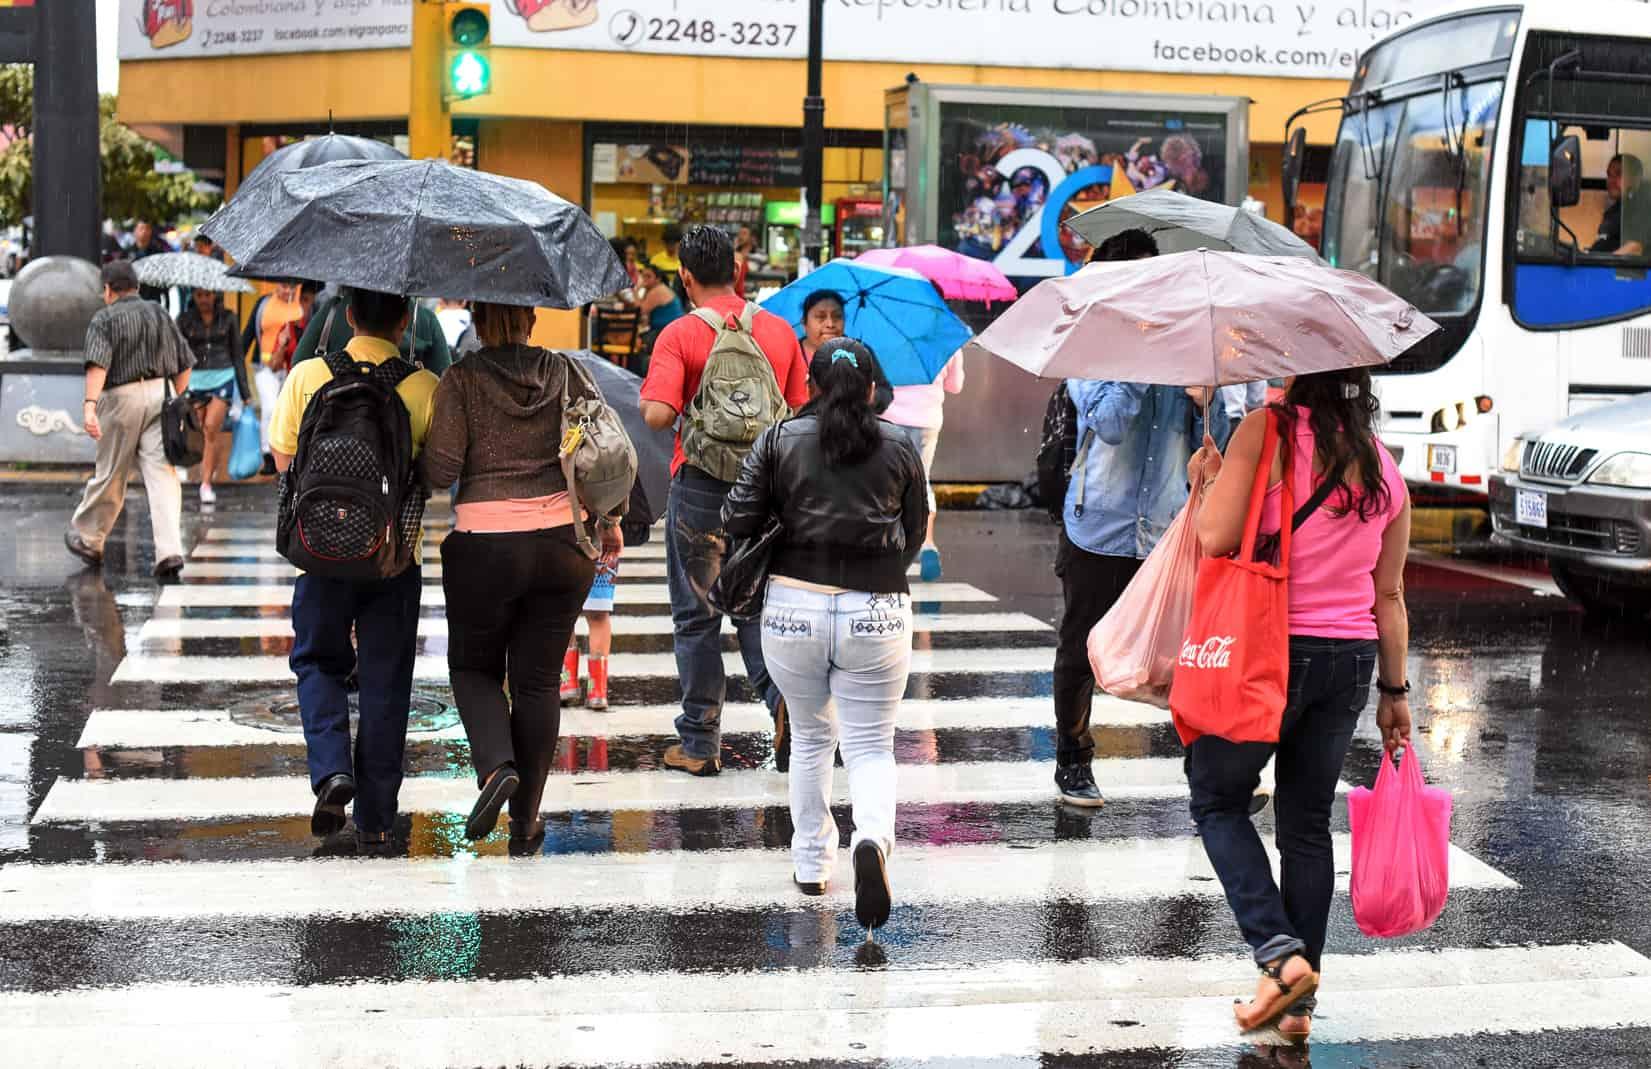 Rains, rainy season in Costa Rica.